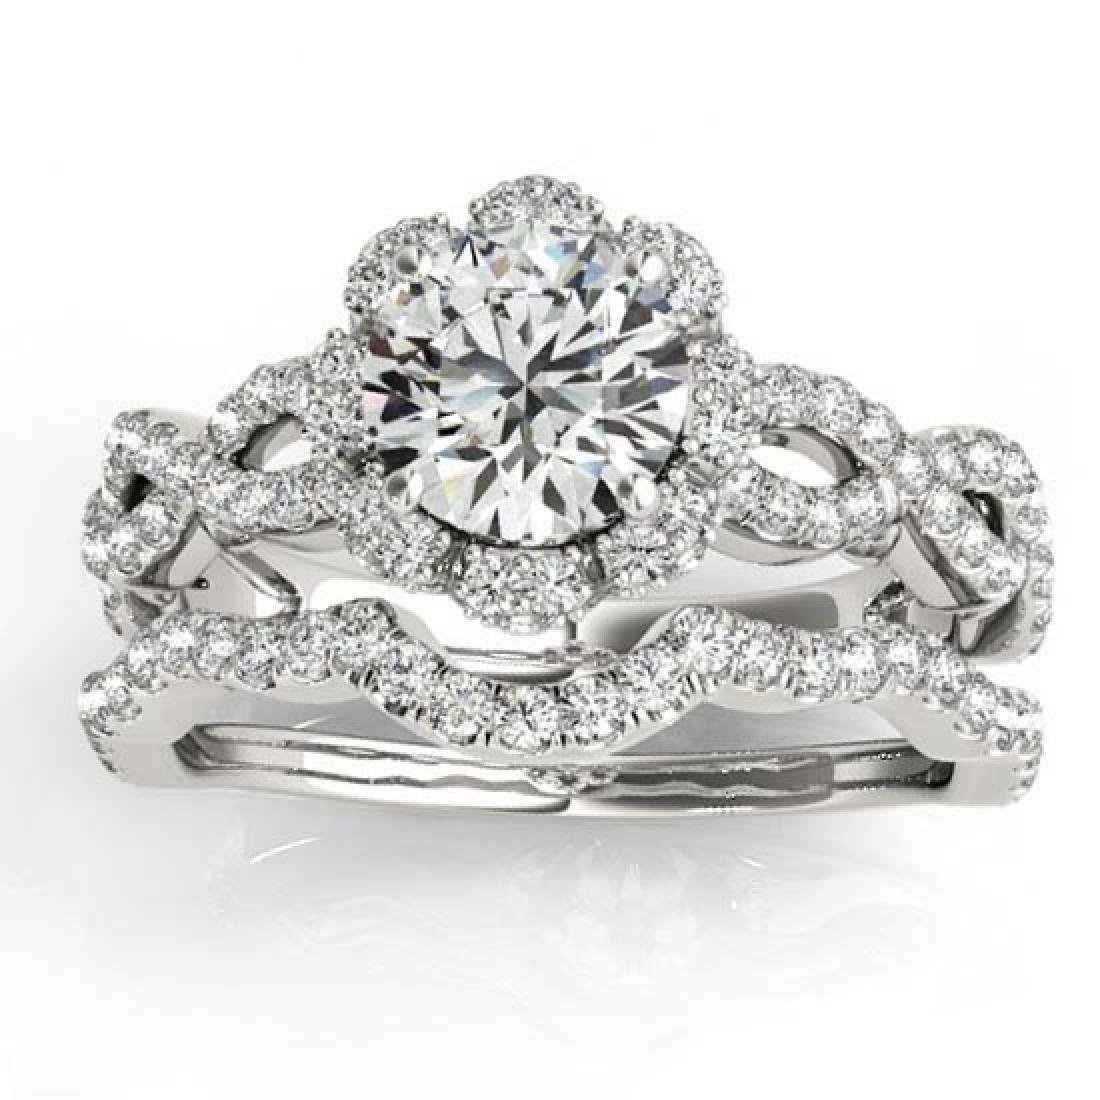 Halo Diamond Engagement and Wedding Rings Bridal Set 14